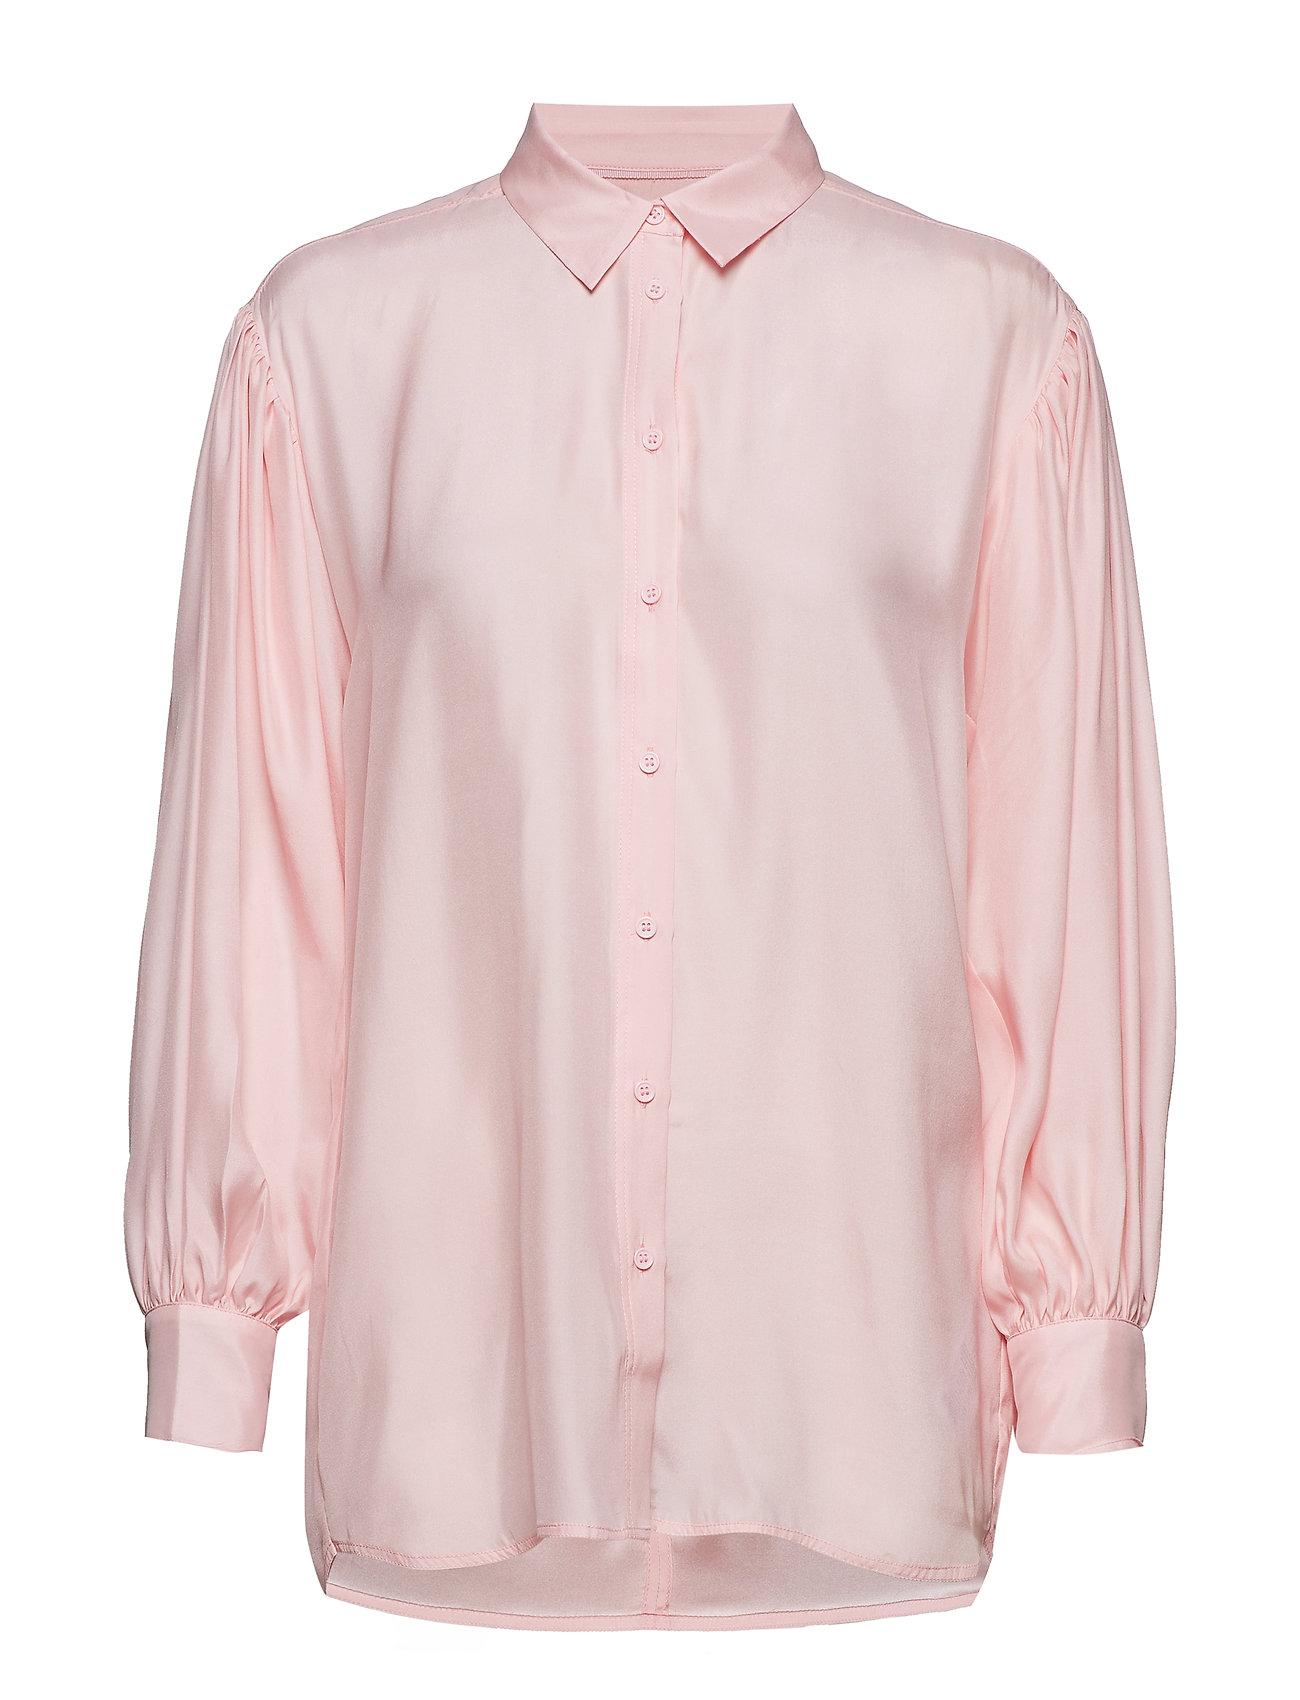 InWear IW50 04 Hutton Shirt - PINK SHADOW